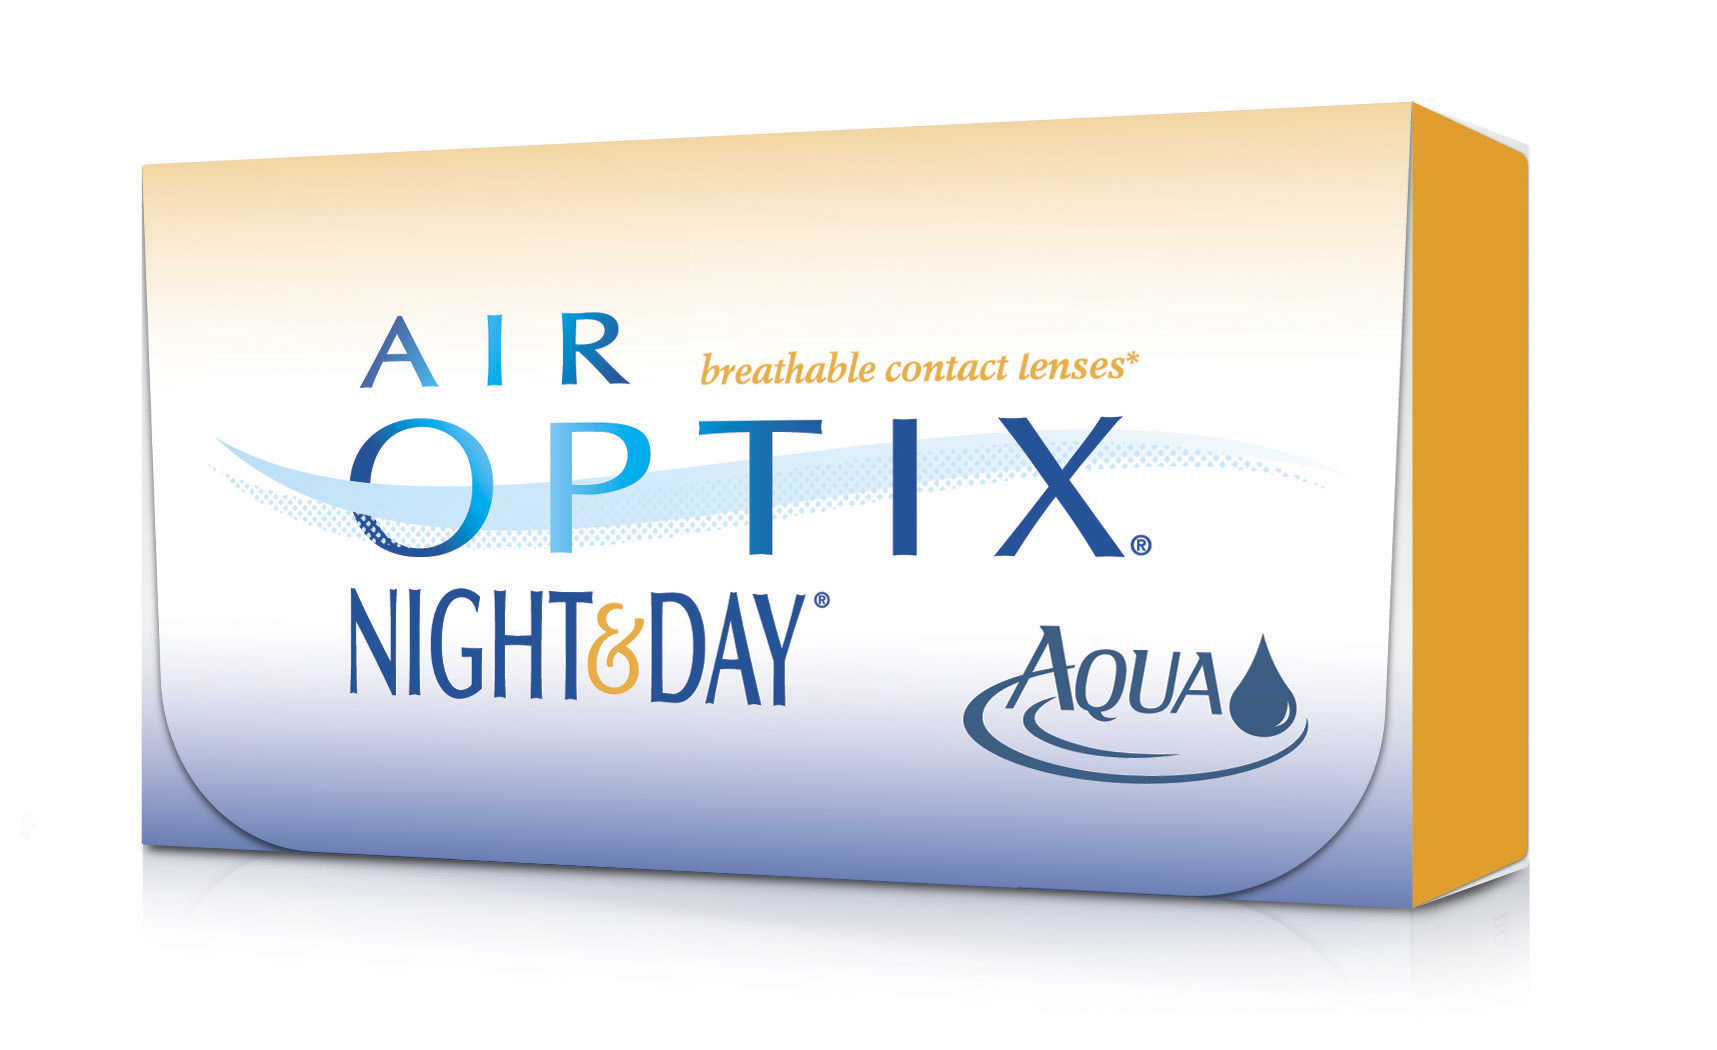 Air Optix Contact Lenses Image